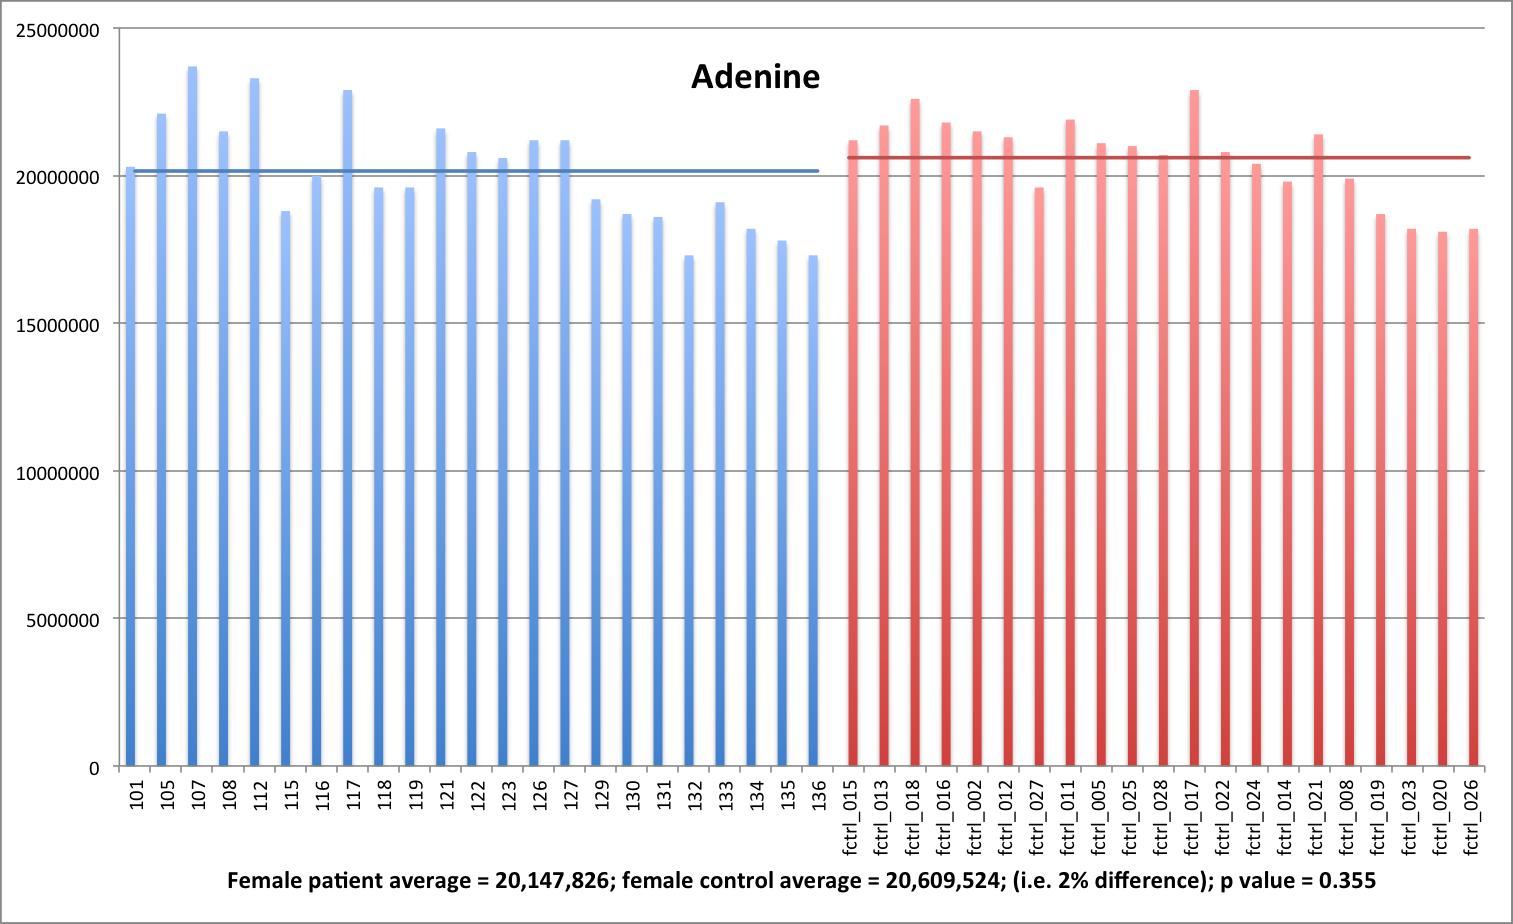 adenine.png